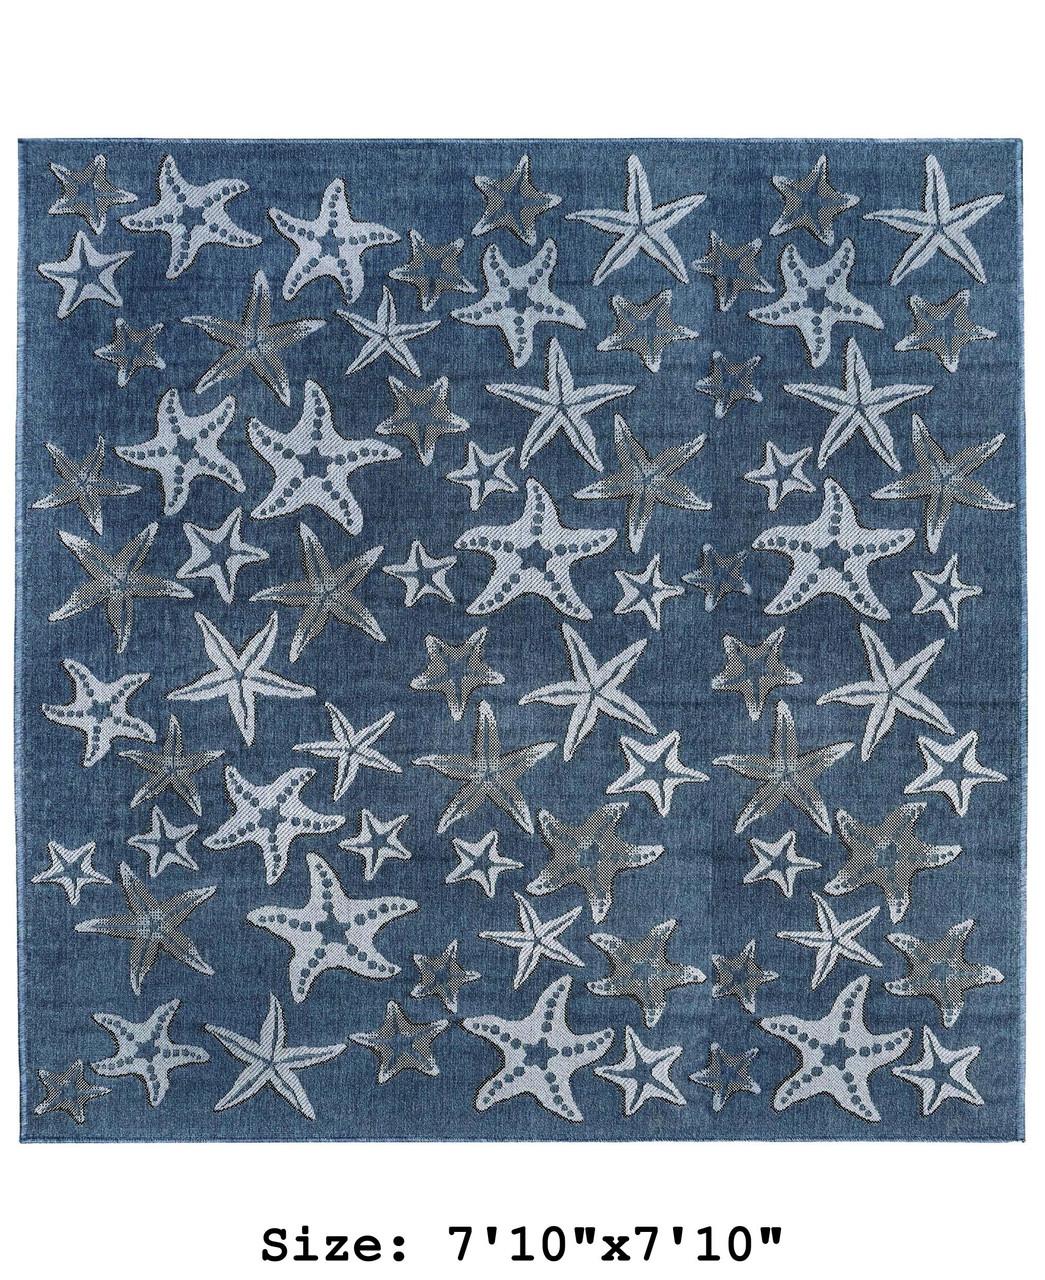 Navy Carmel Starfish Indoor/Outdoor Rug - Square